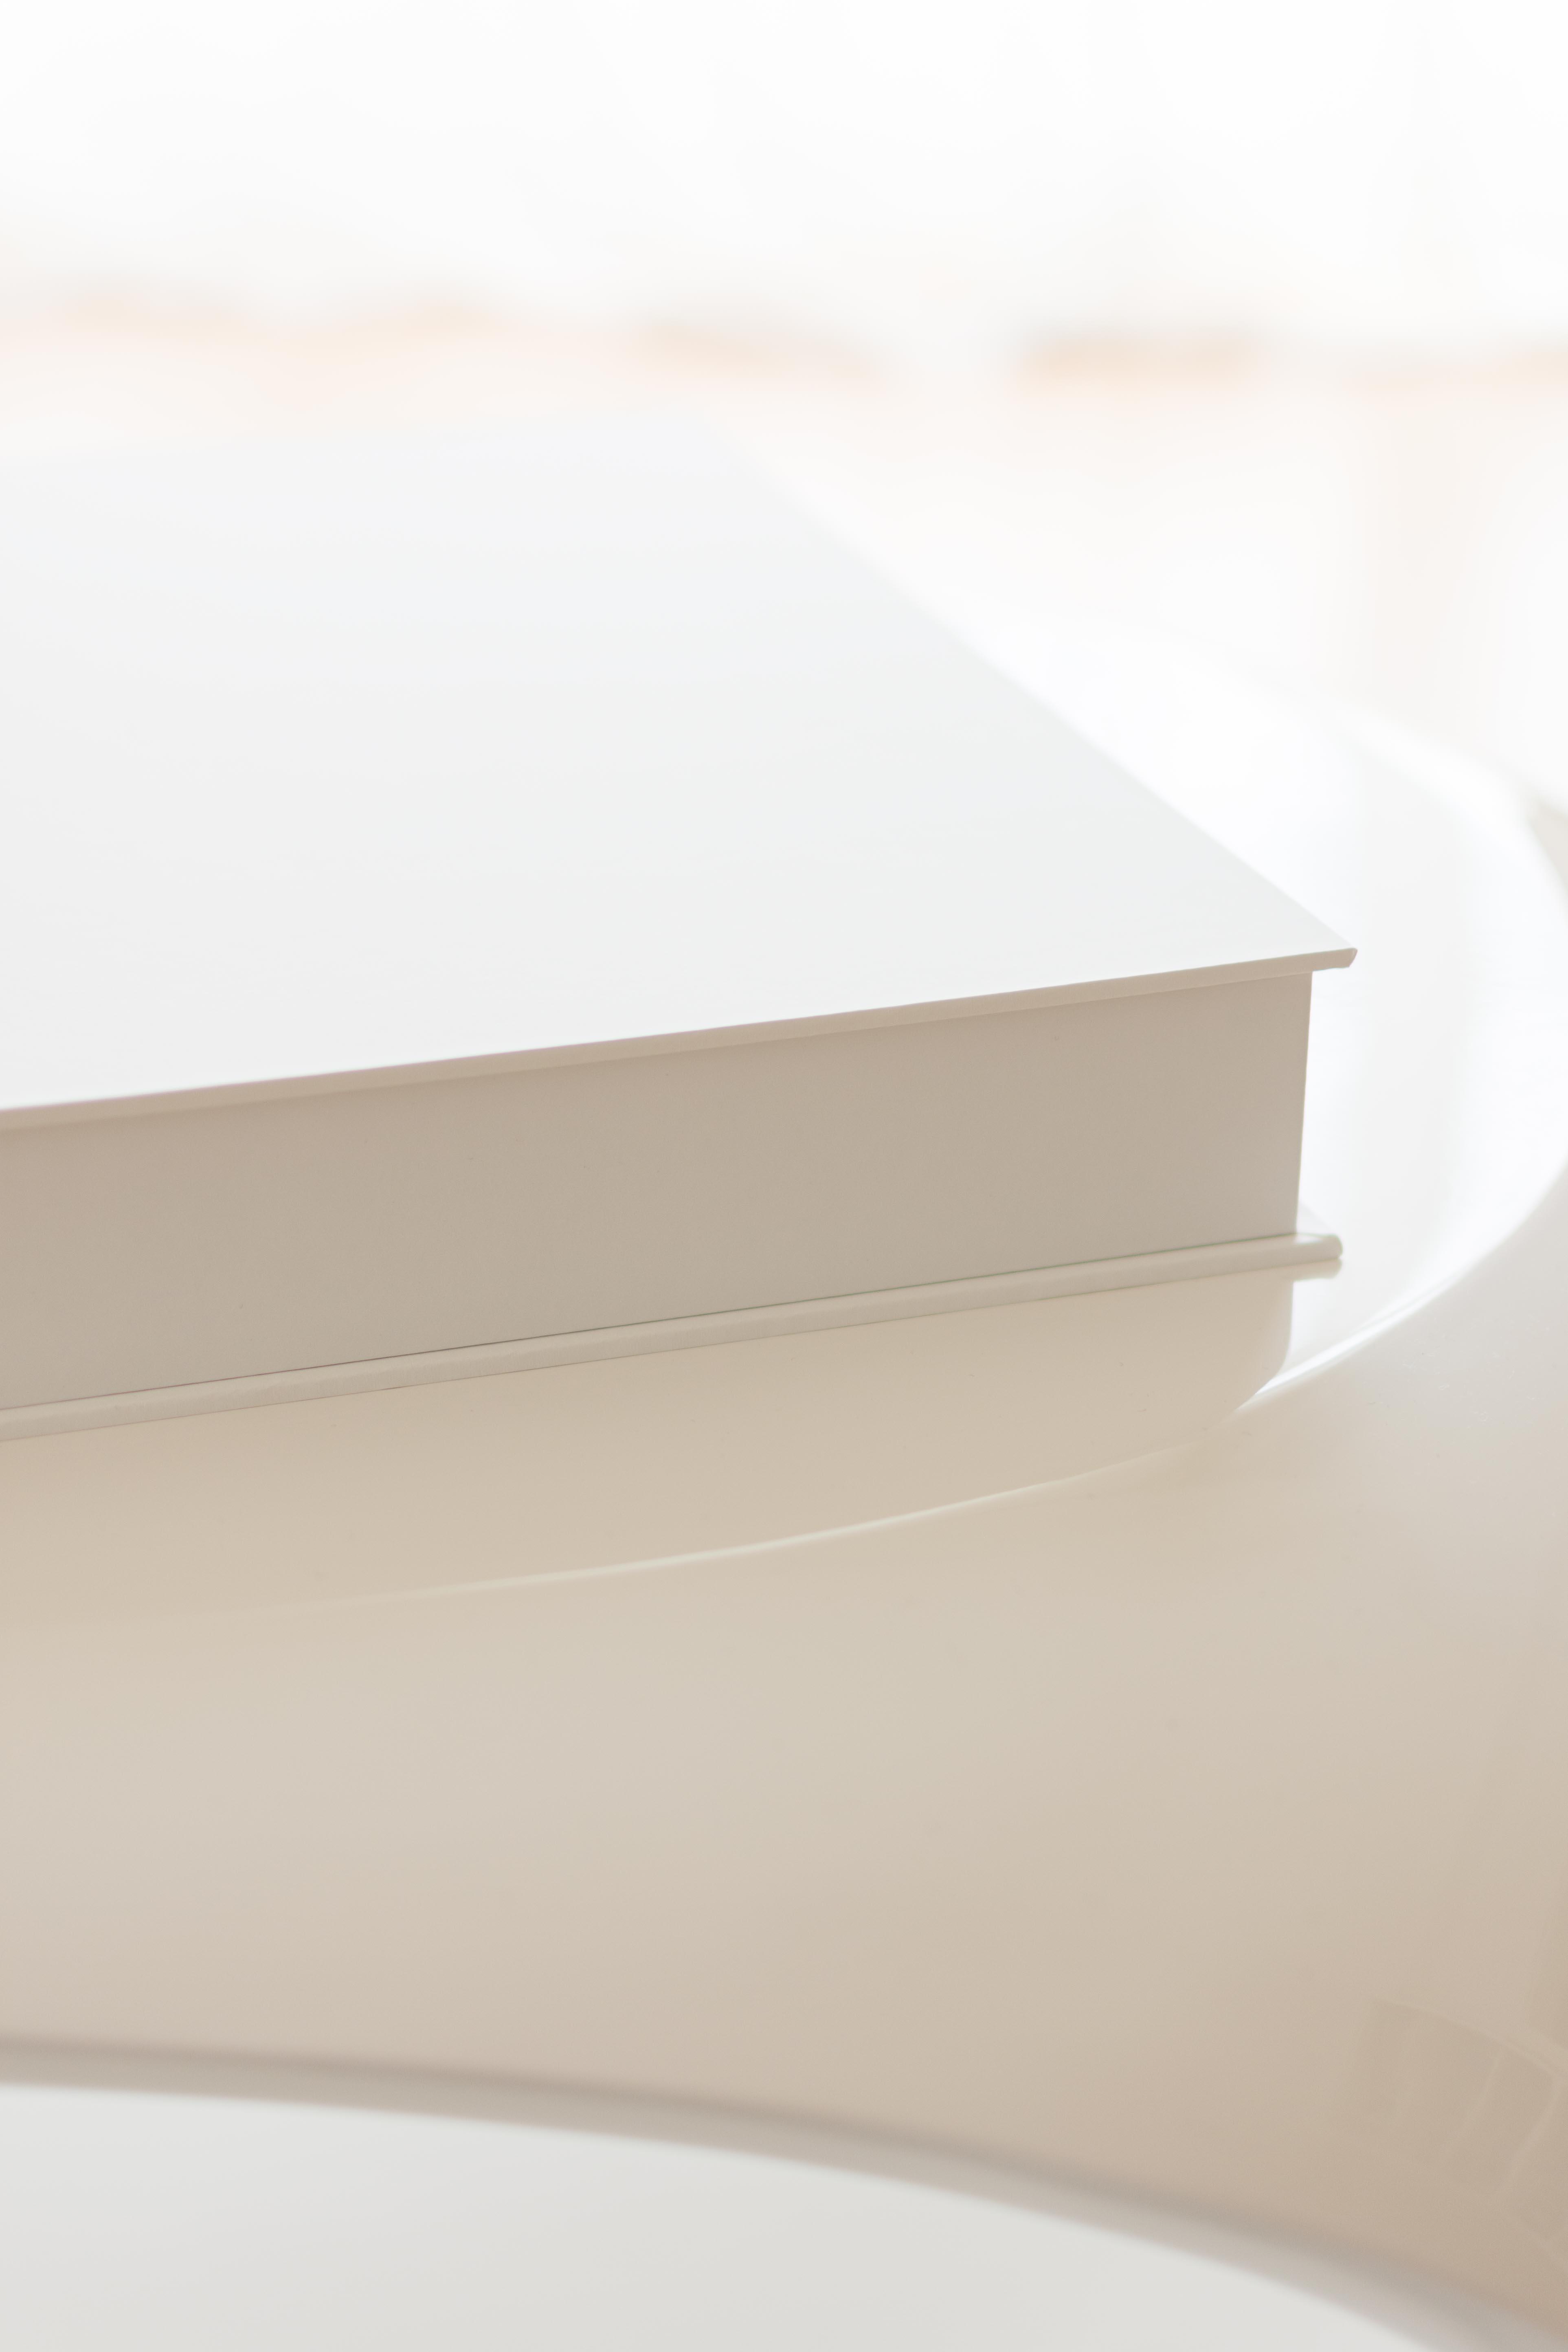 folio box, fine art photography, monika payer photo